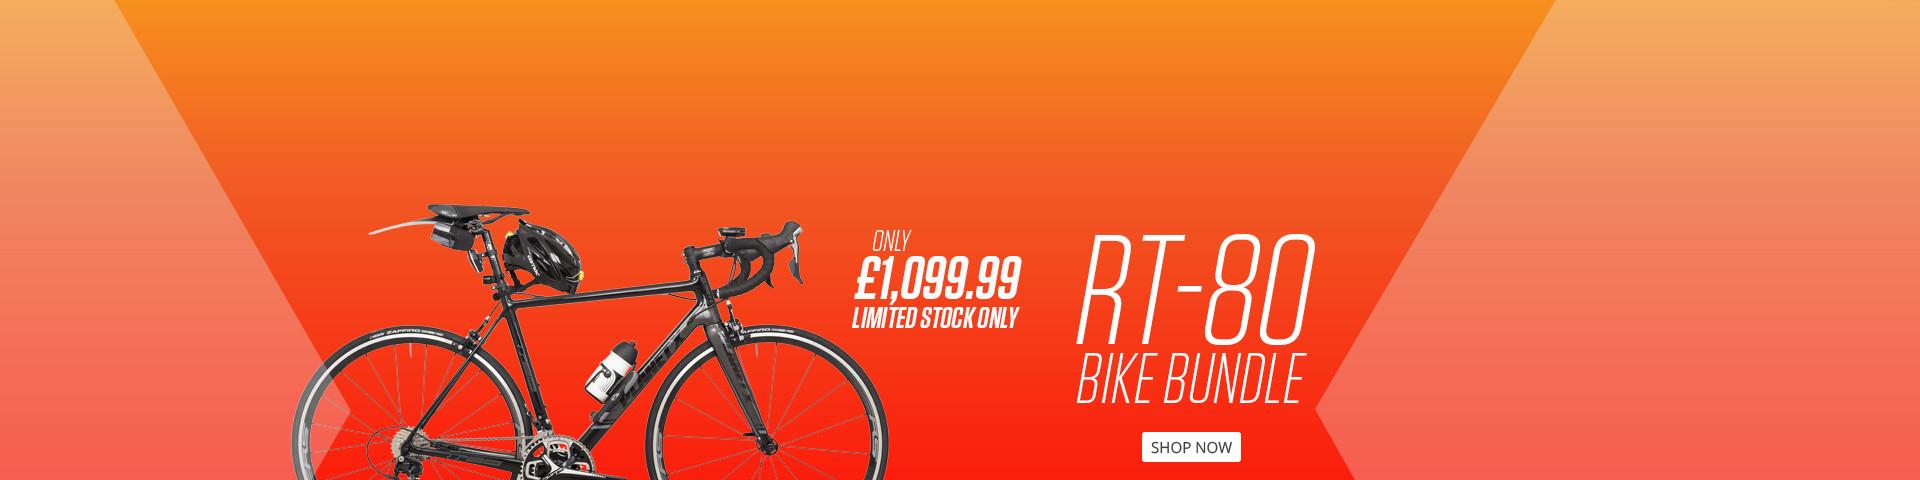 Fully Loaded RT-80 Shimano 105 Road Bike Bundle